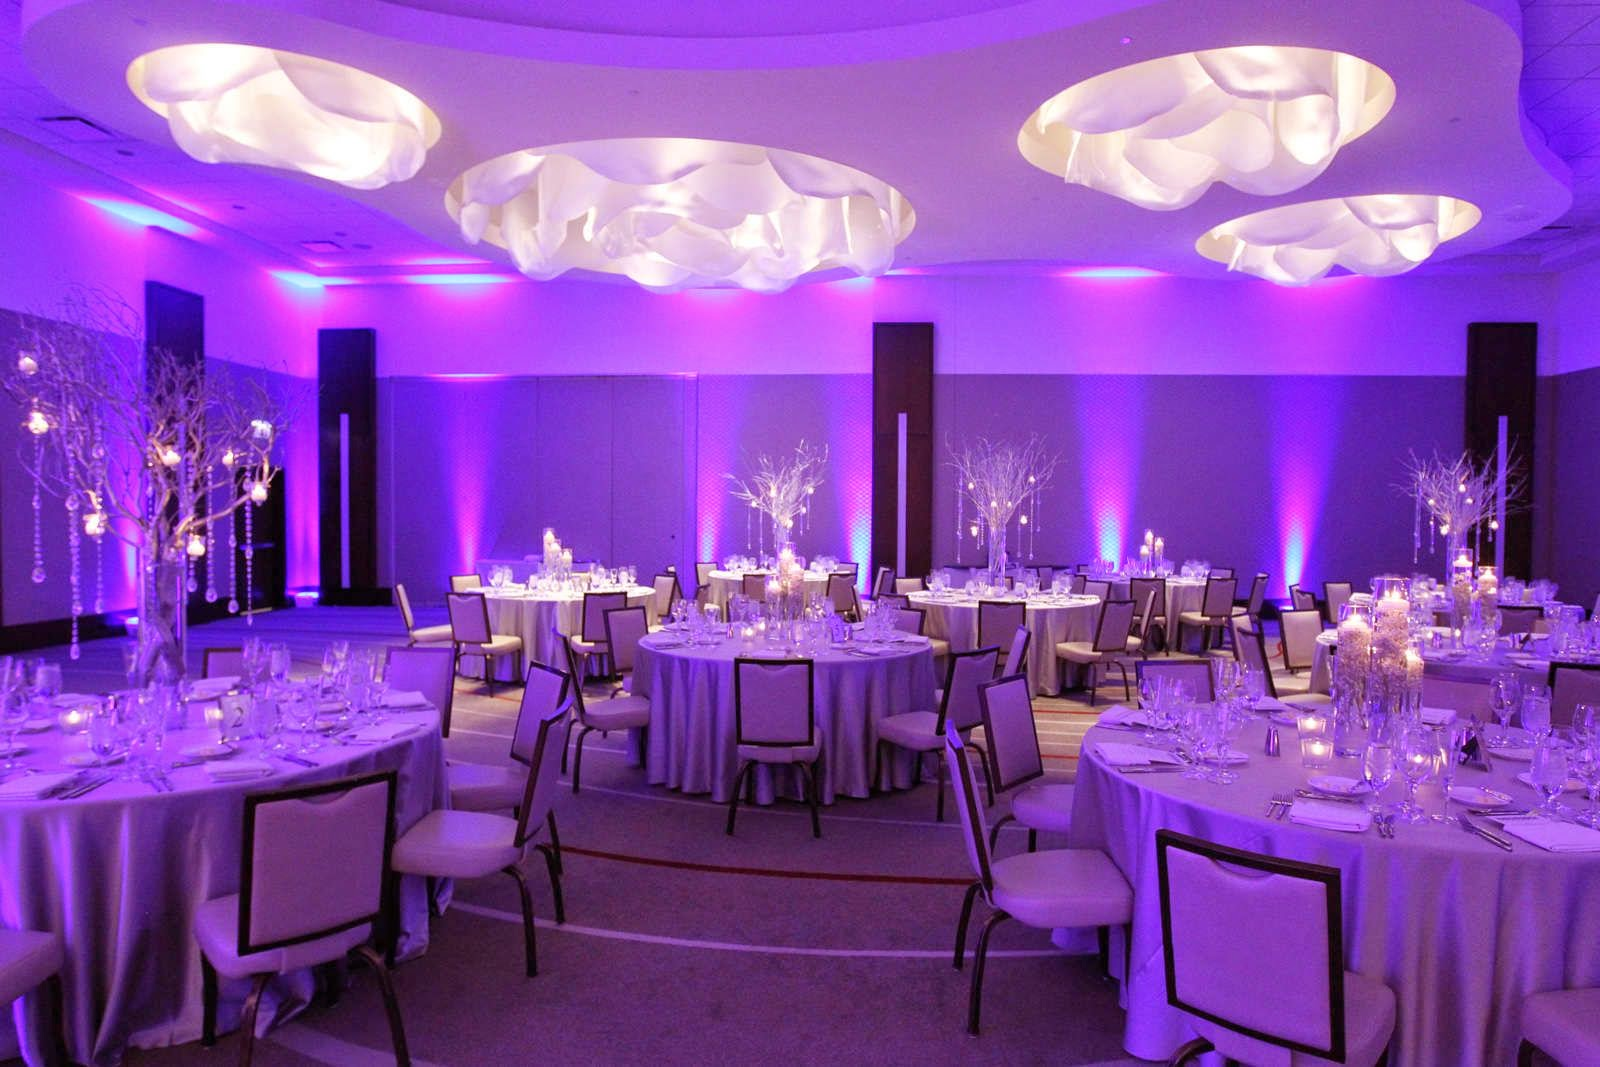 Best Wedding Decorations: Perfect Purple Wedding ...